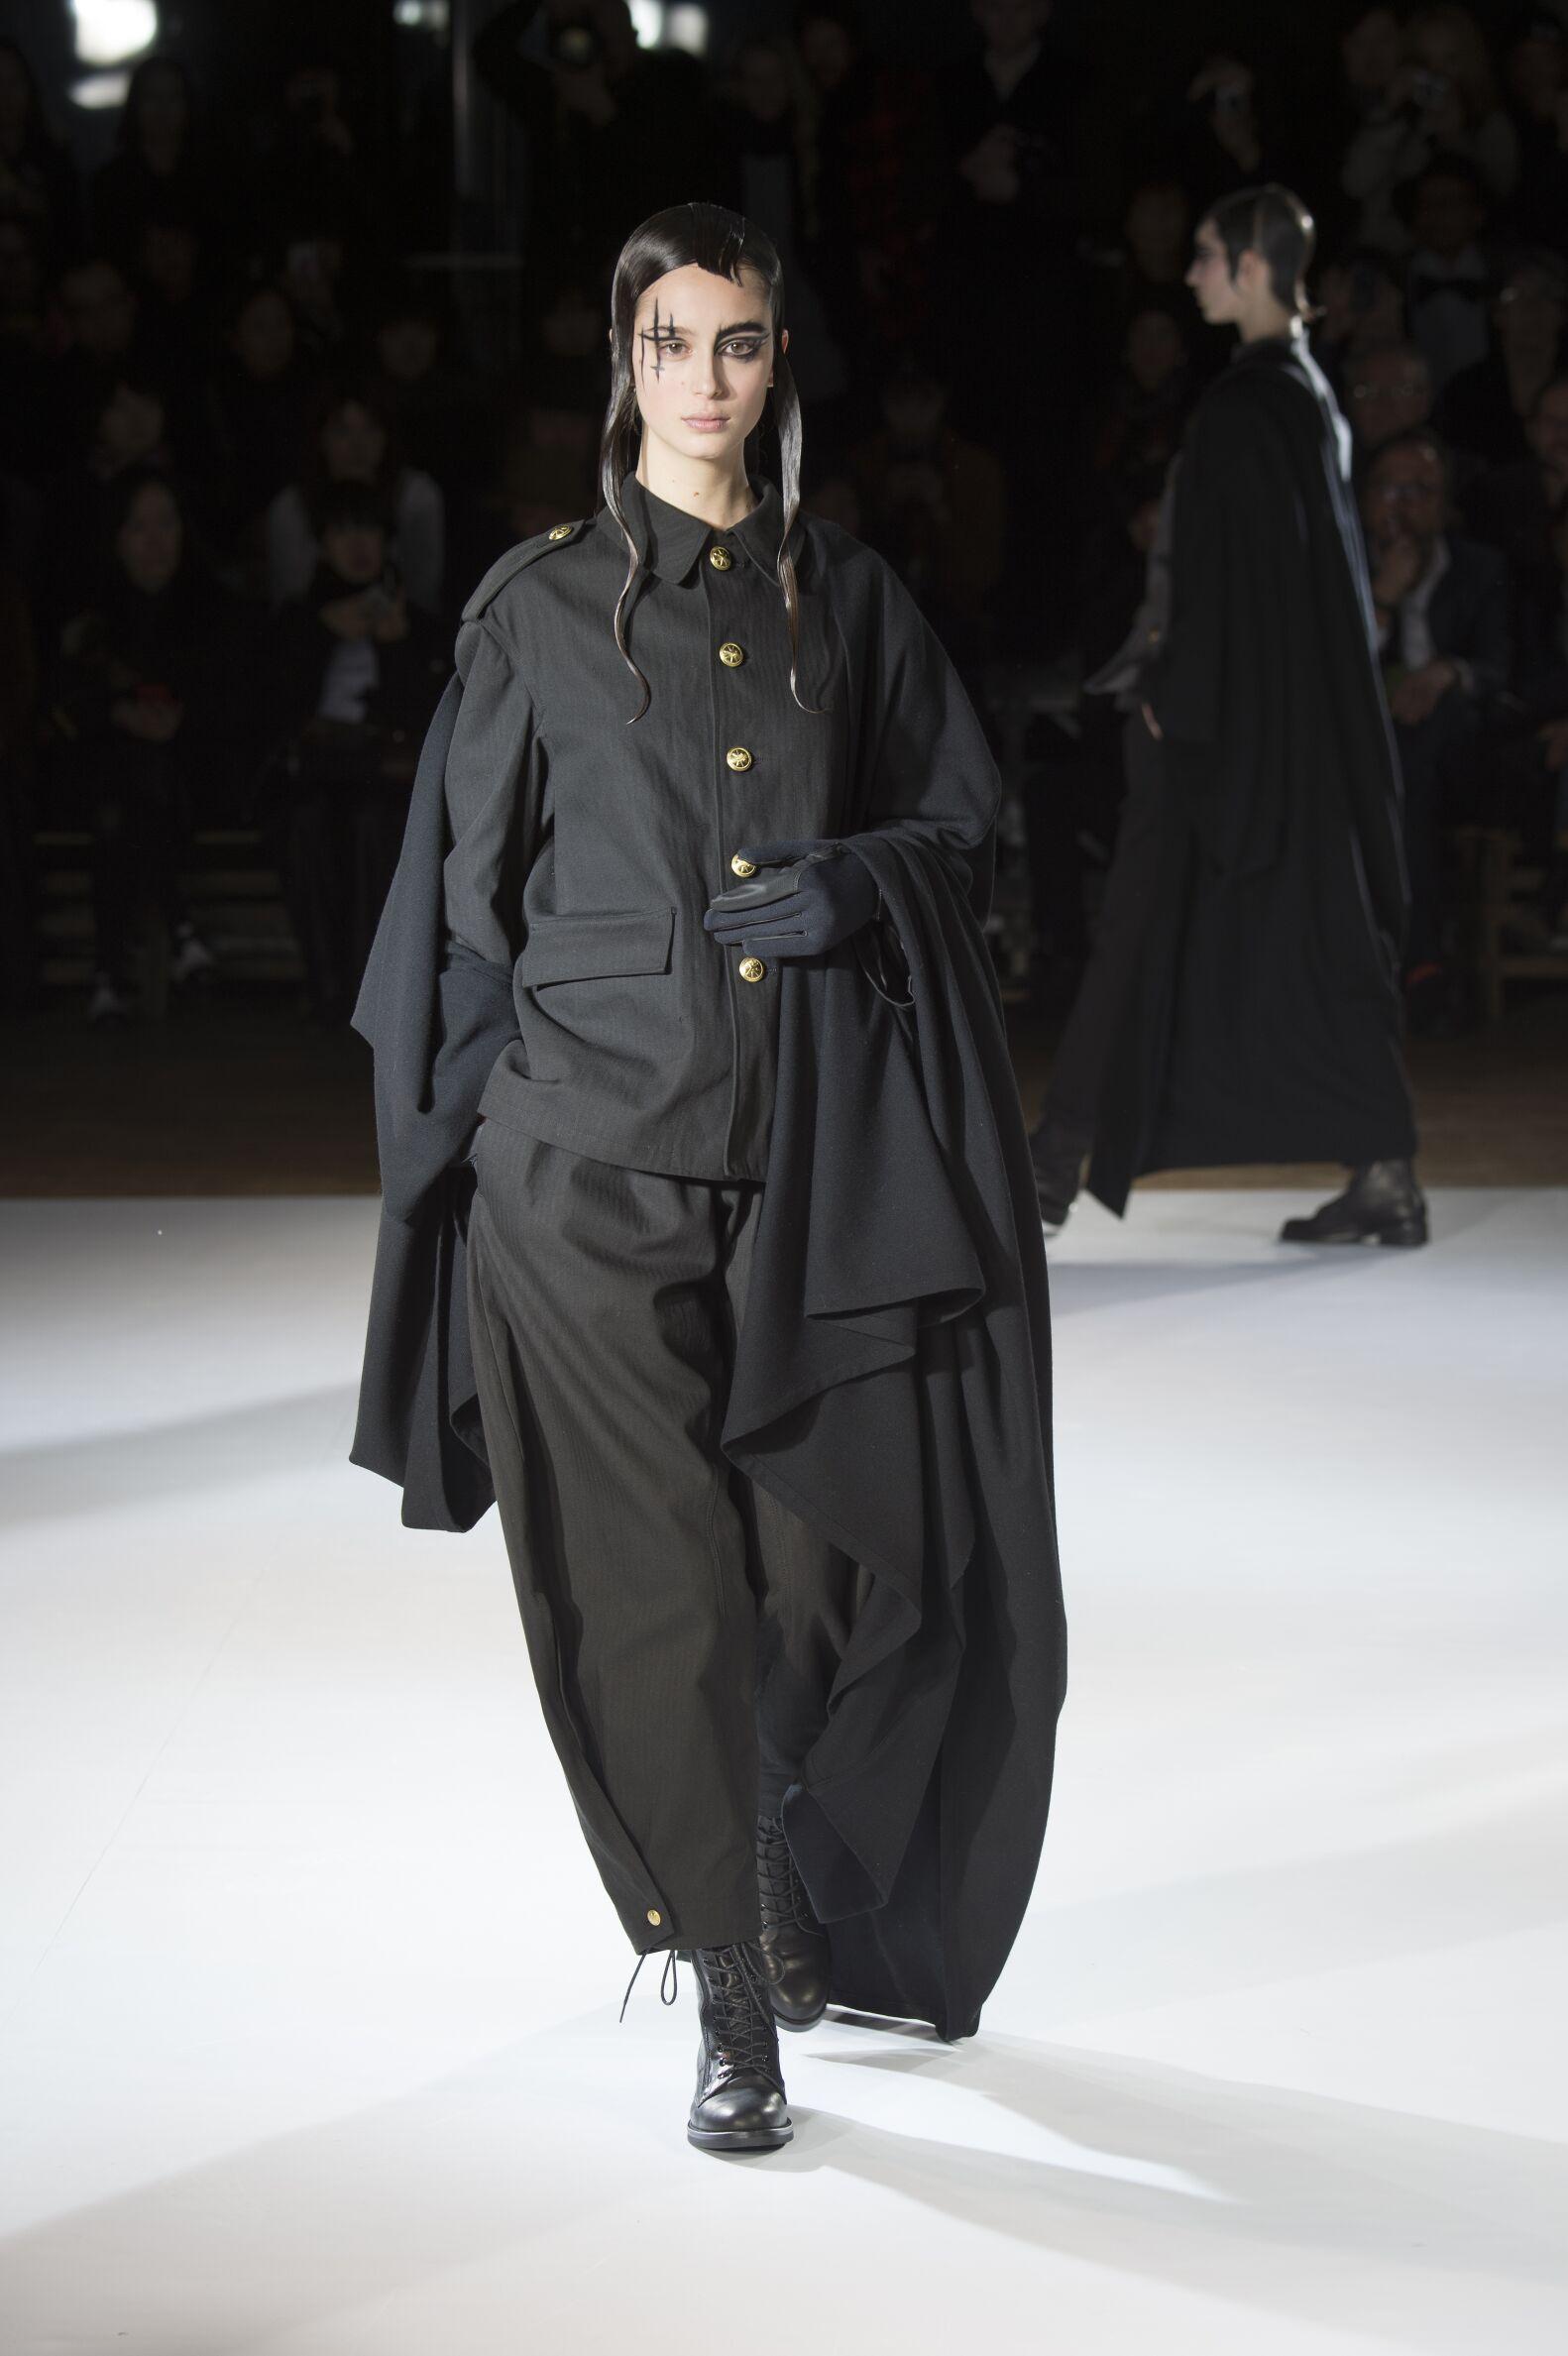 Runway Yohji Yamamoto Fashion Show Winter 2015